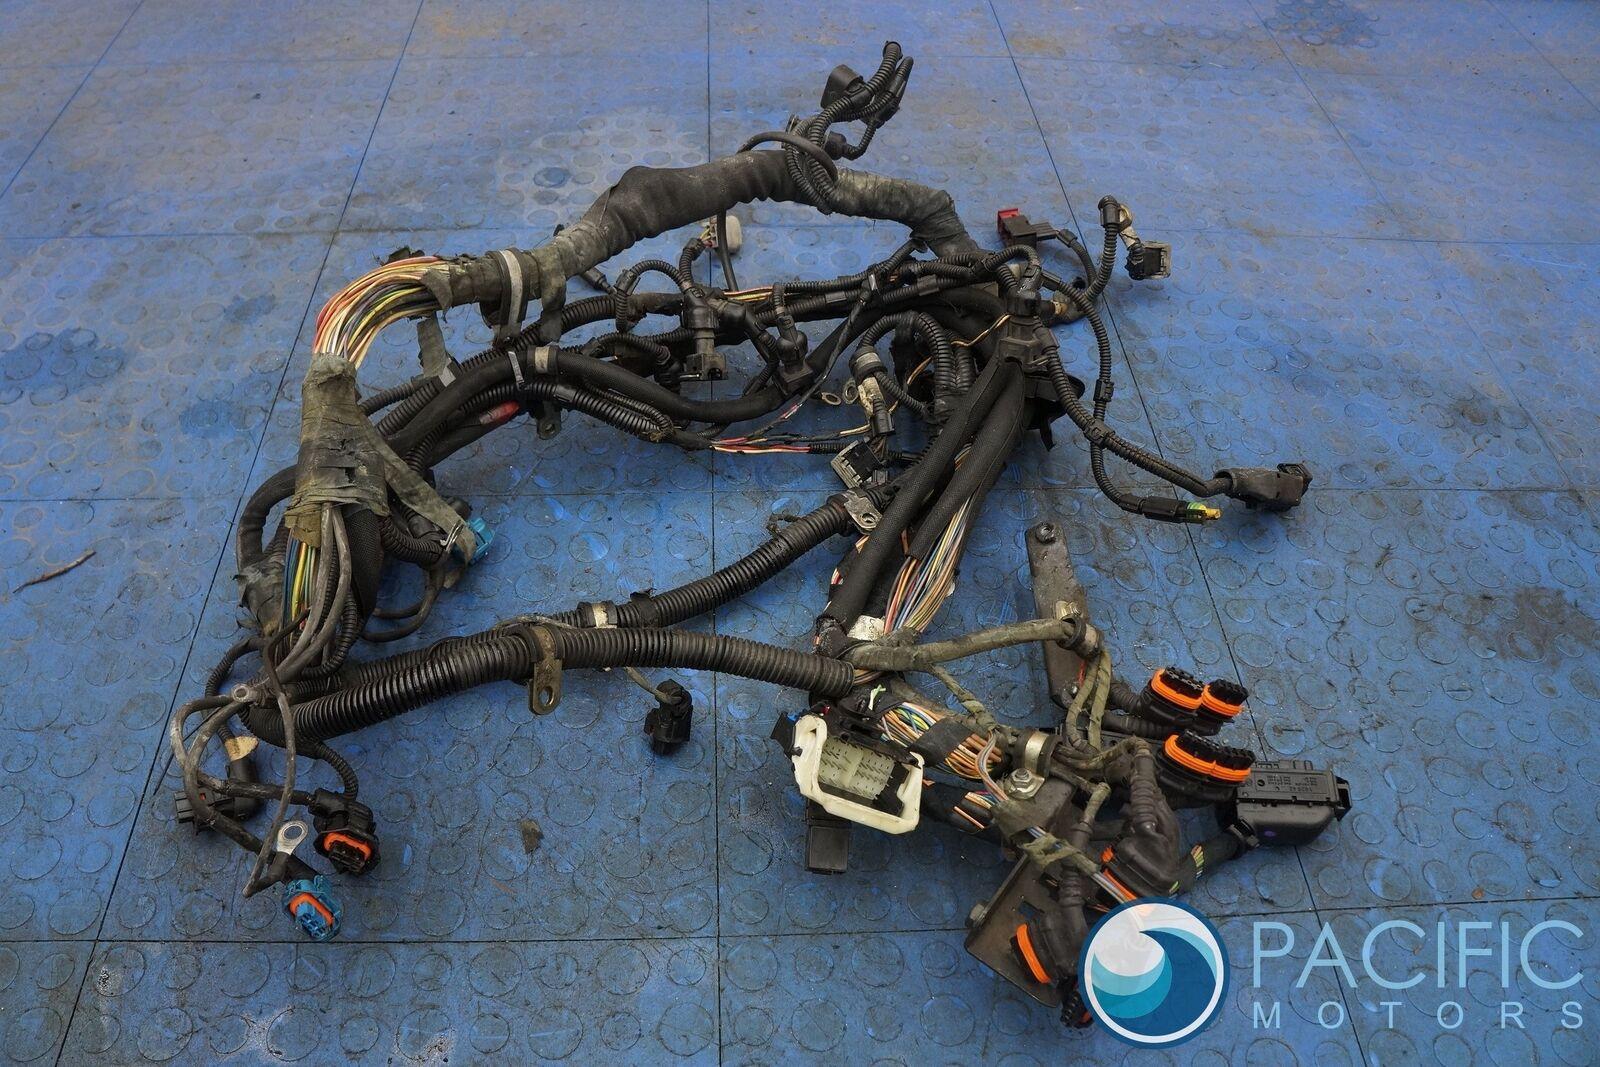 Maserati Wiring Harness Wire Center Truck Connectors 2002 Basic Guide Diagram U2022 Rh Needpixies Com Dodge